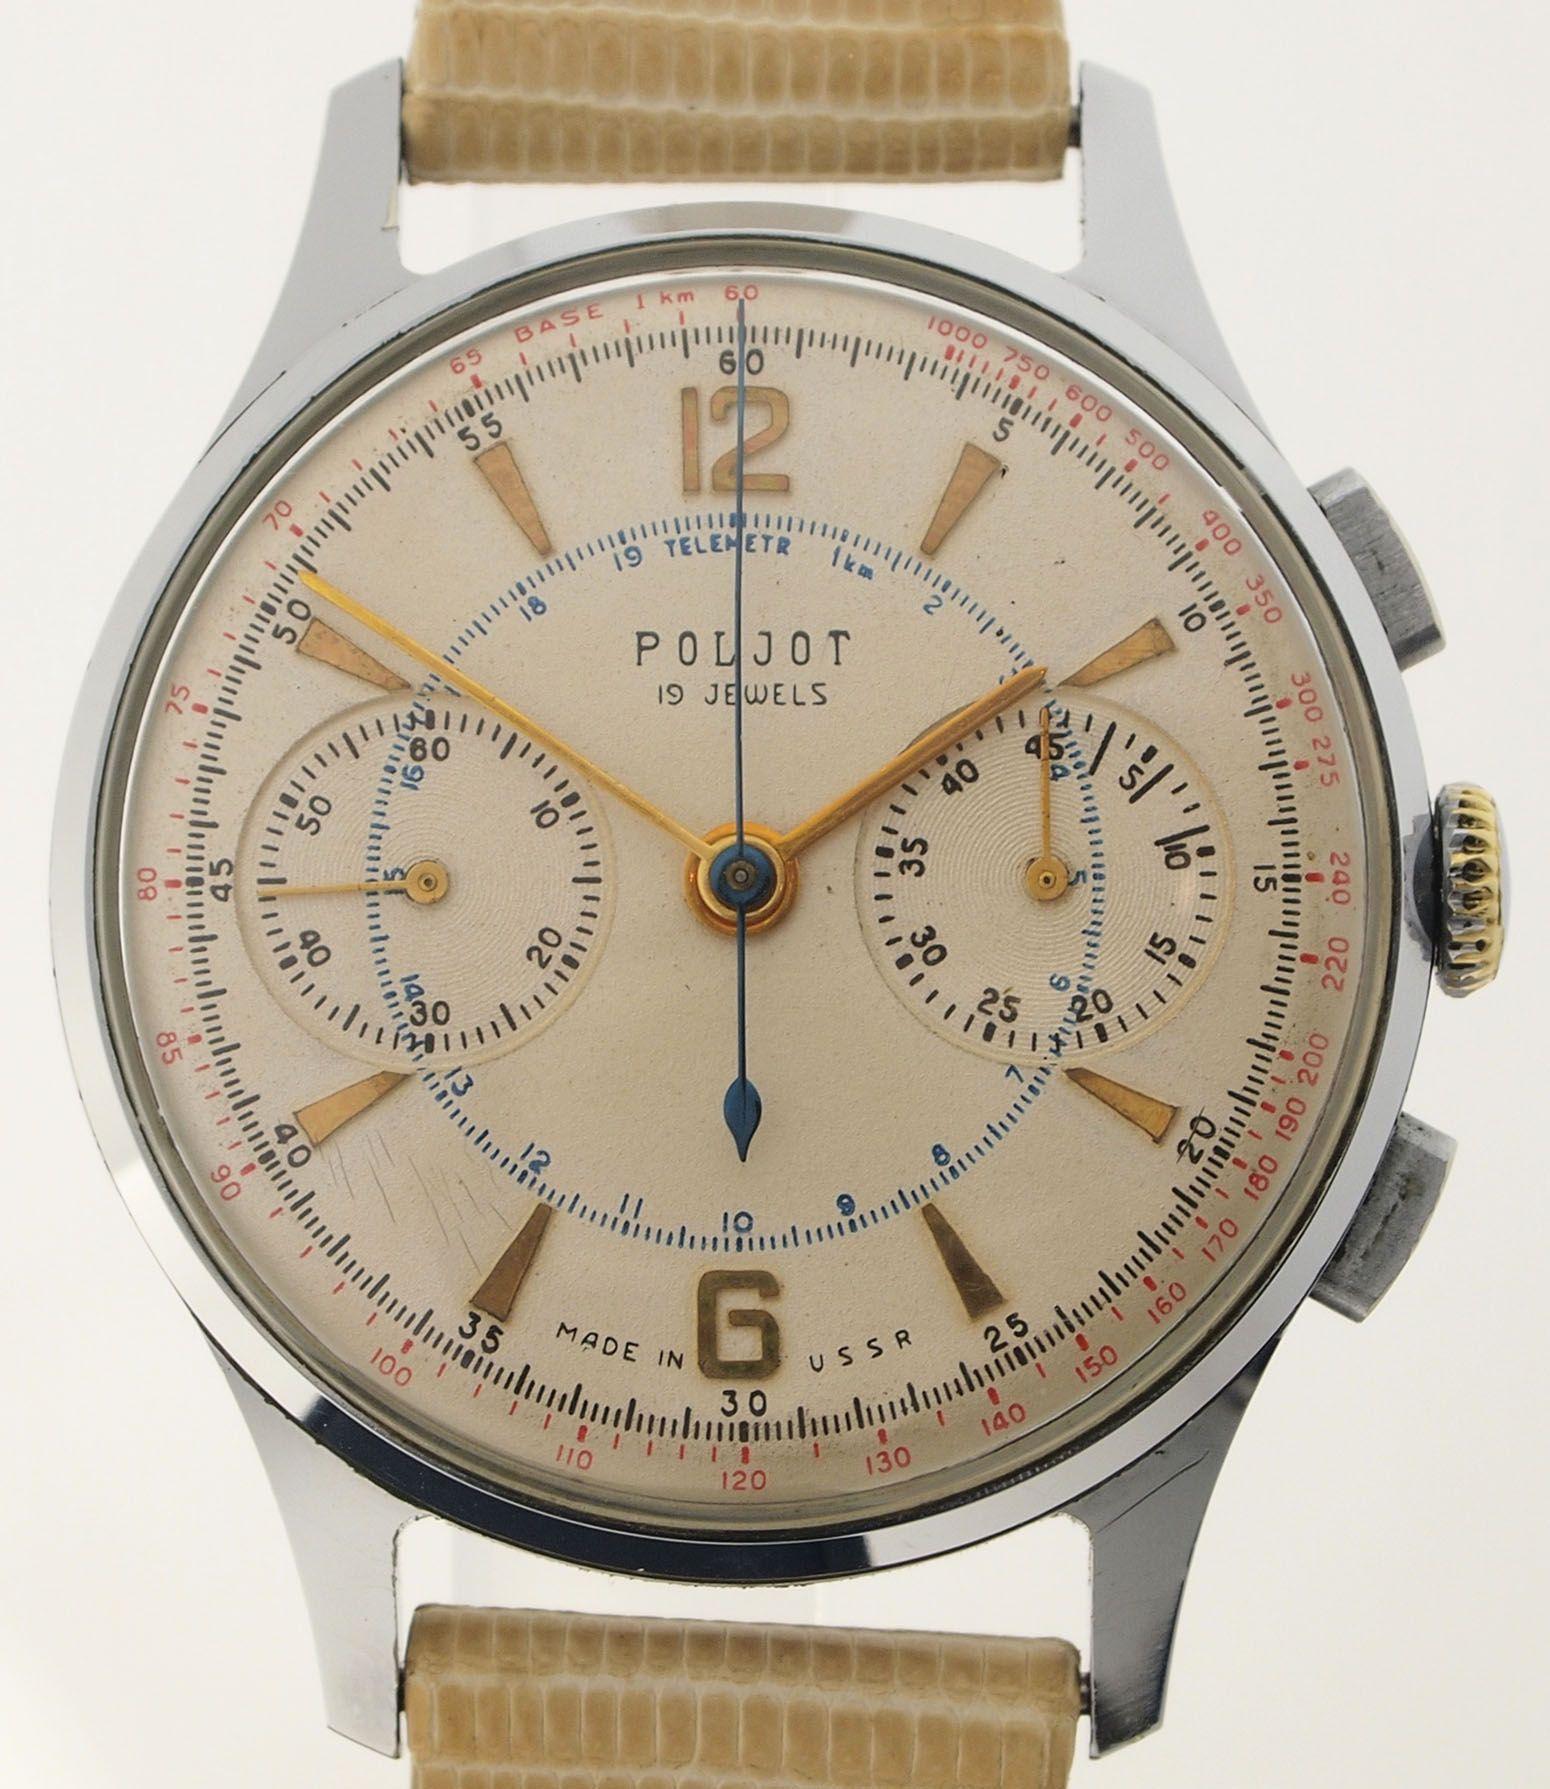 Poljot Chronograph Caliber 3017 Strela Venus 150 Early 1960ies Orologio Vintage Orologi Da Uomo Orologi Alla Moda